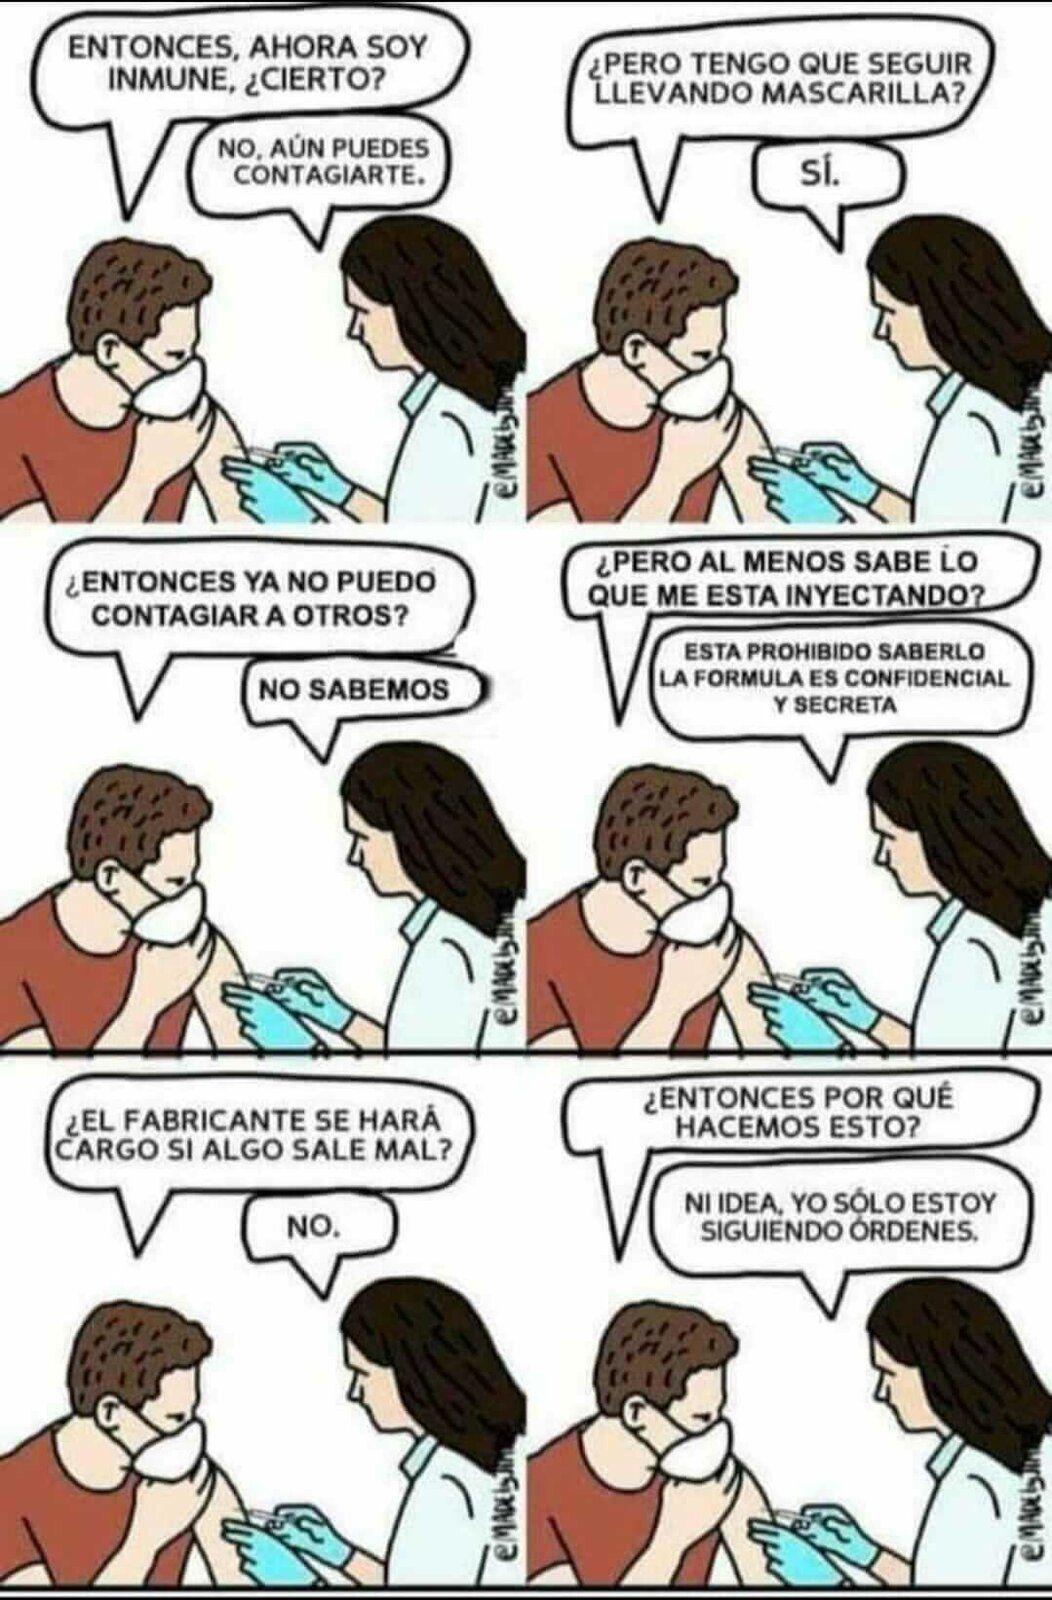 Viñeta-Comic-Vacuna-COVID19.jpg